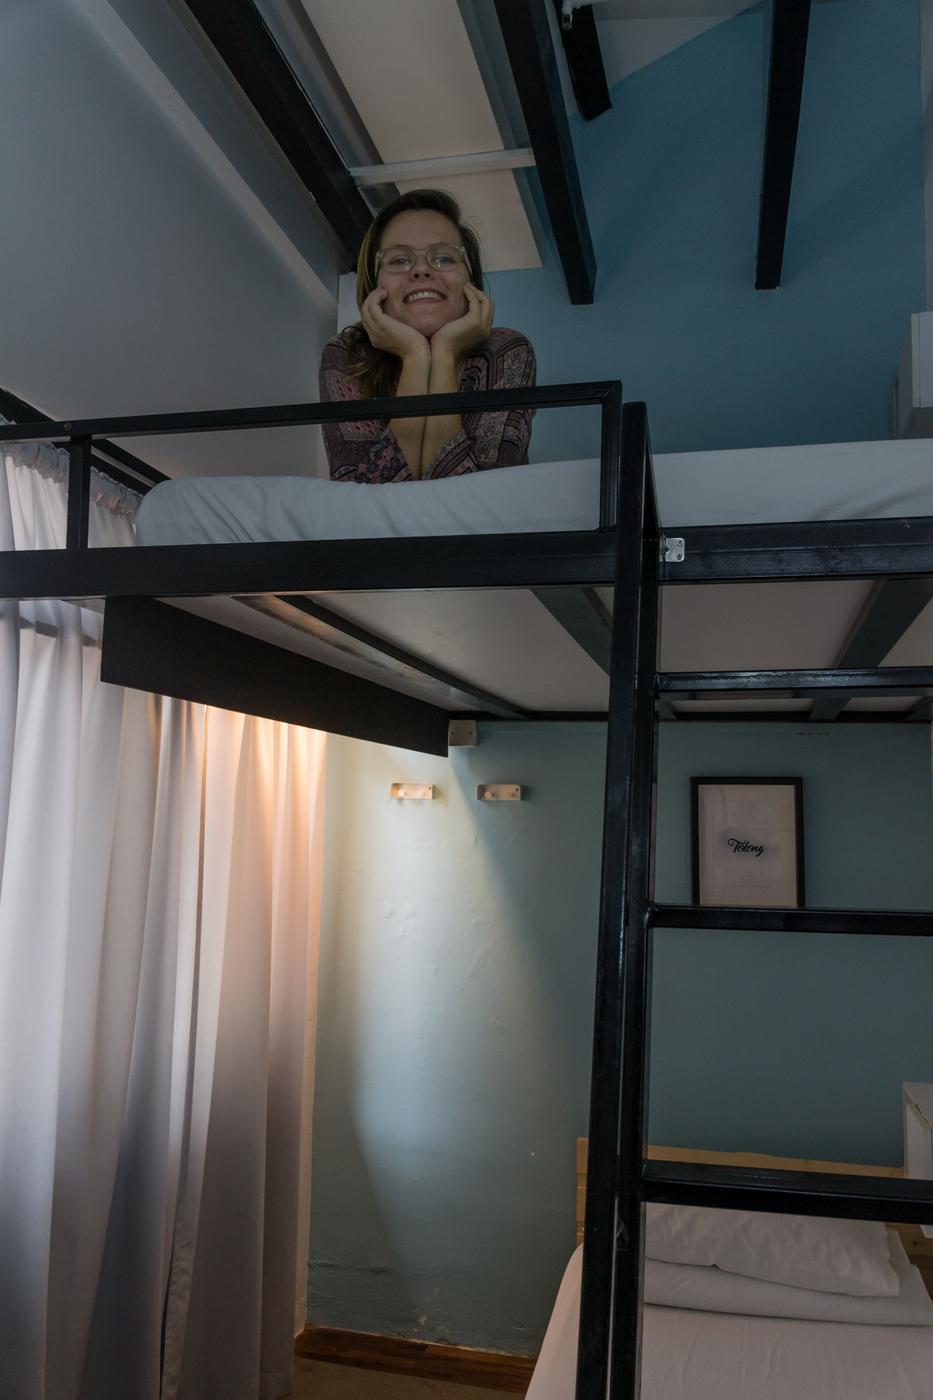 5footway-inn-loft-room.jpg